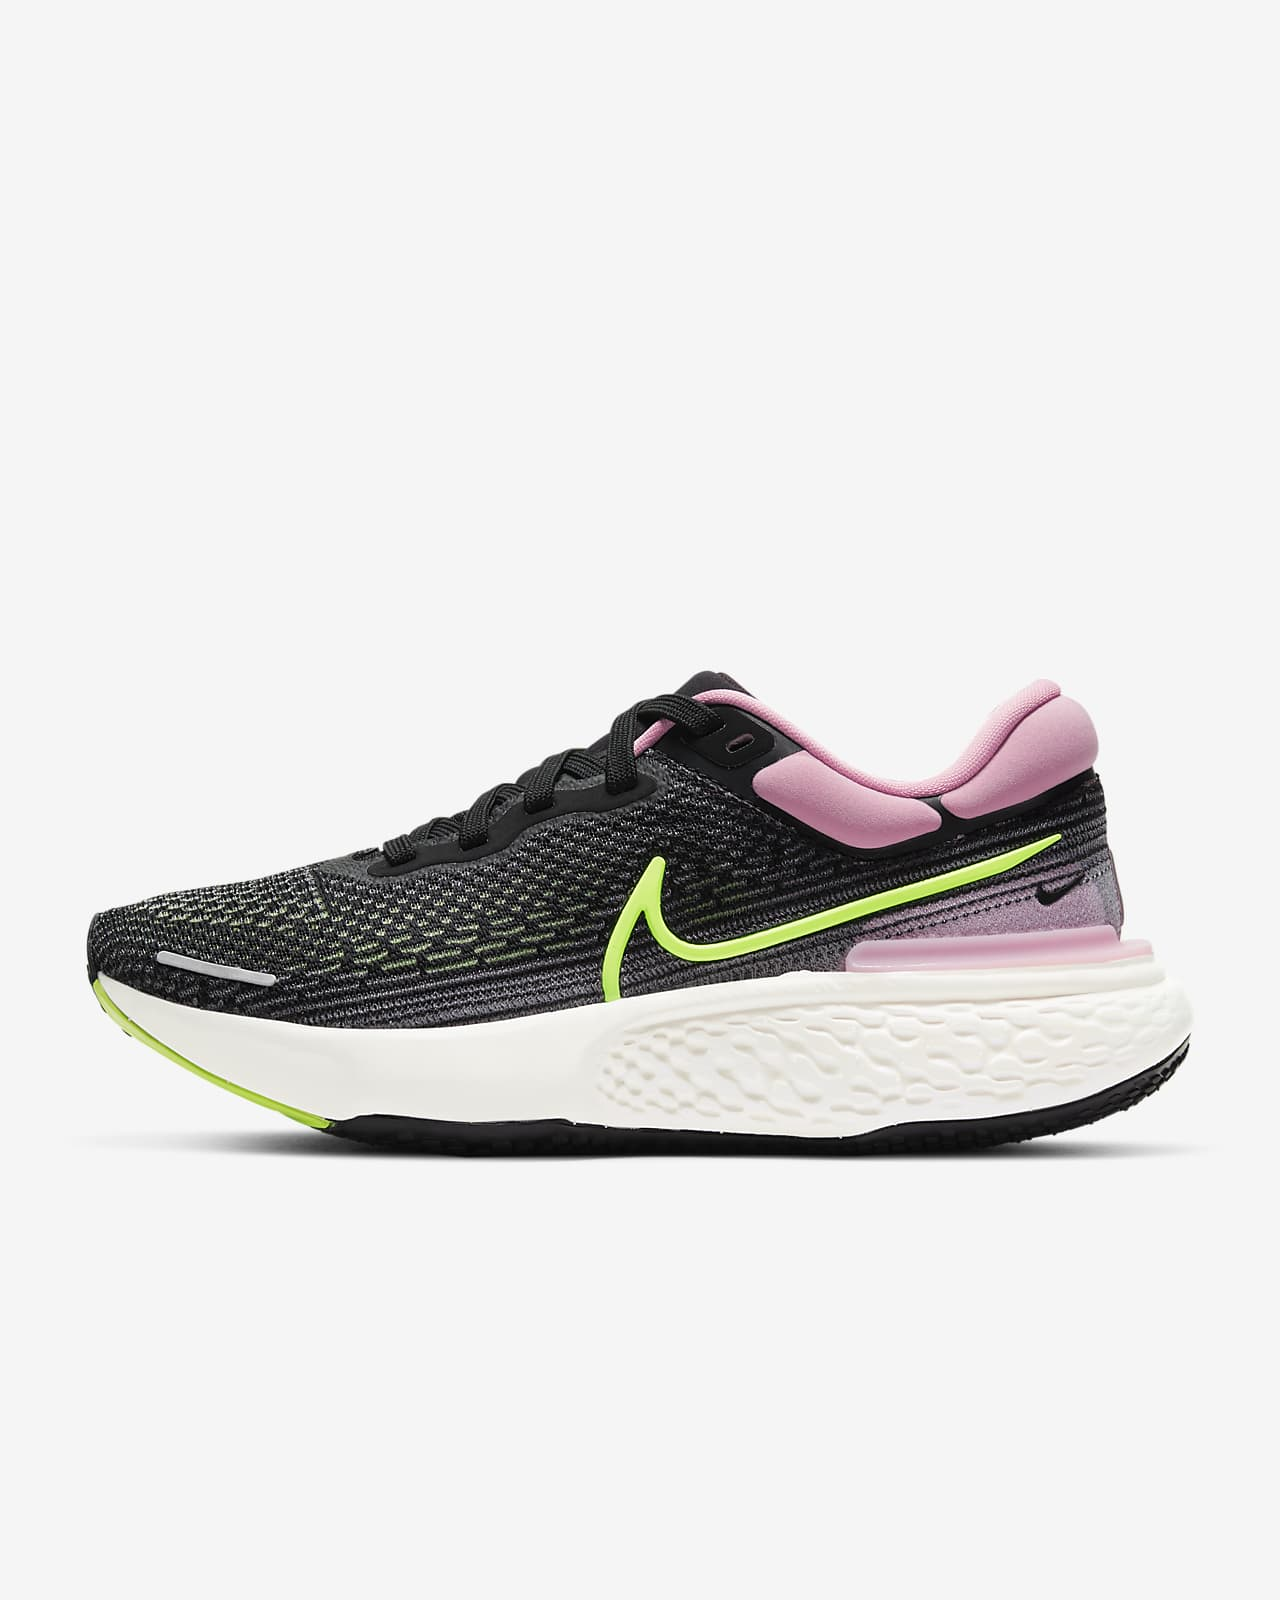 Chaussures de running Nike ZoomX Invincible Run Flyknit pour Femme